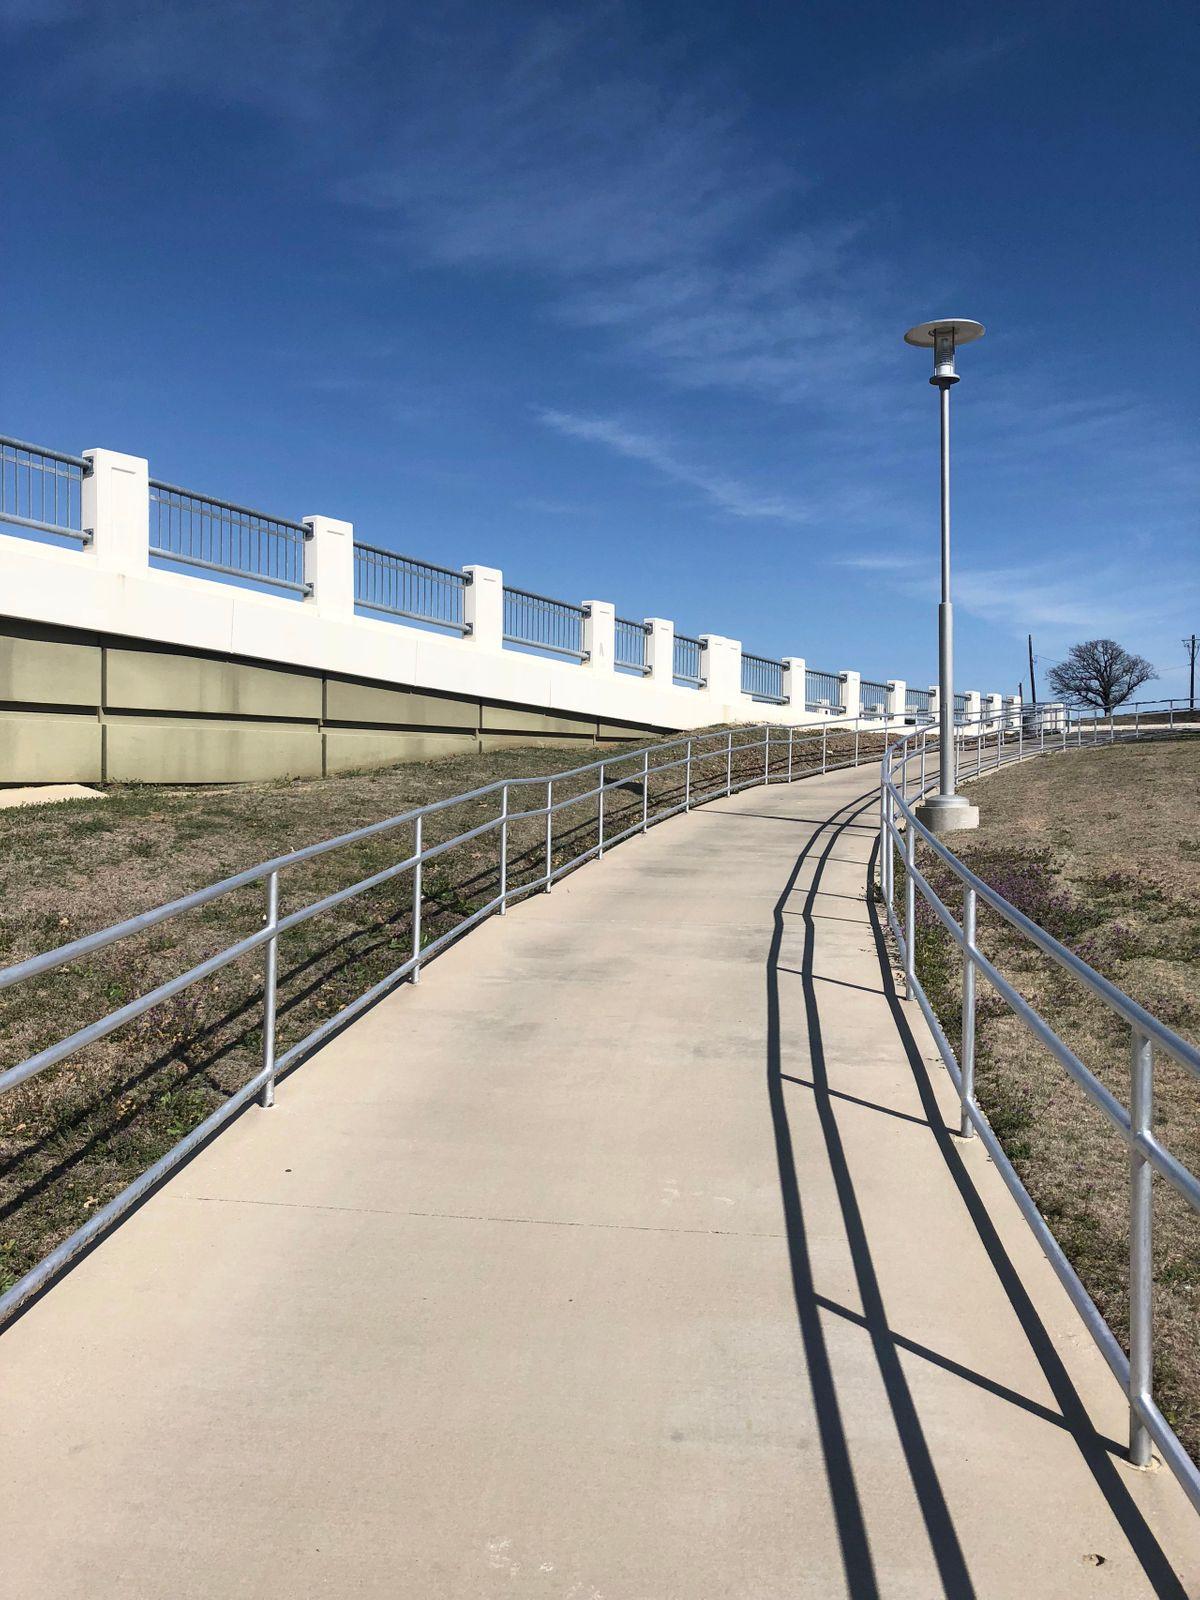 University of North Texas Schools Photo Video Shoot Location06.JPG